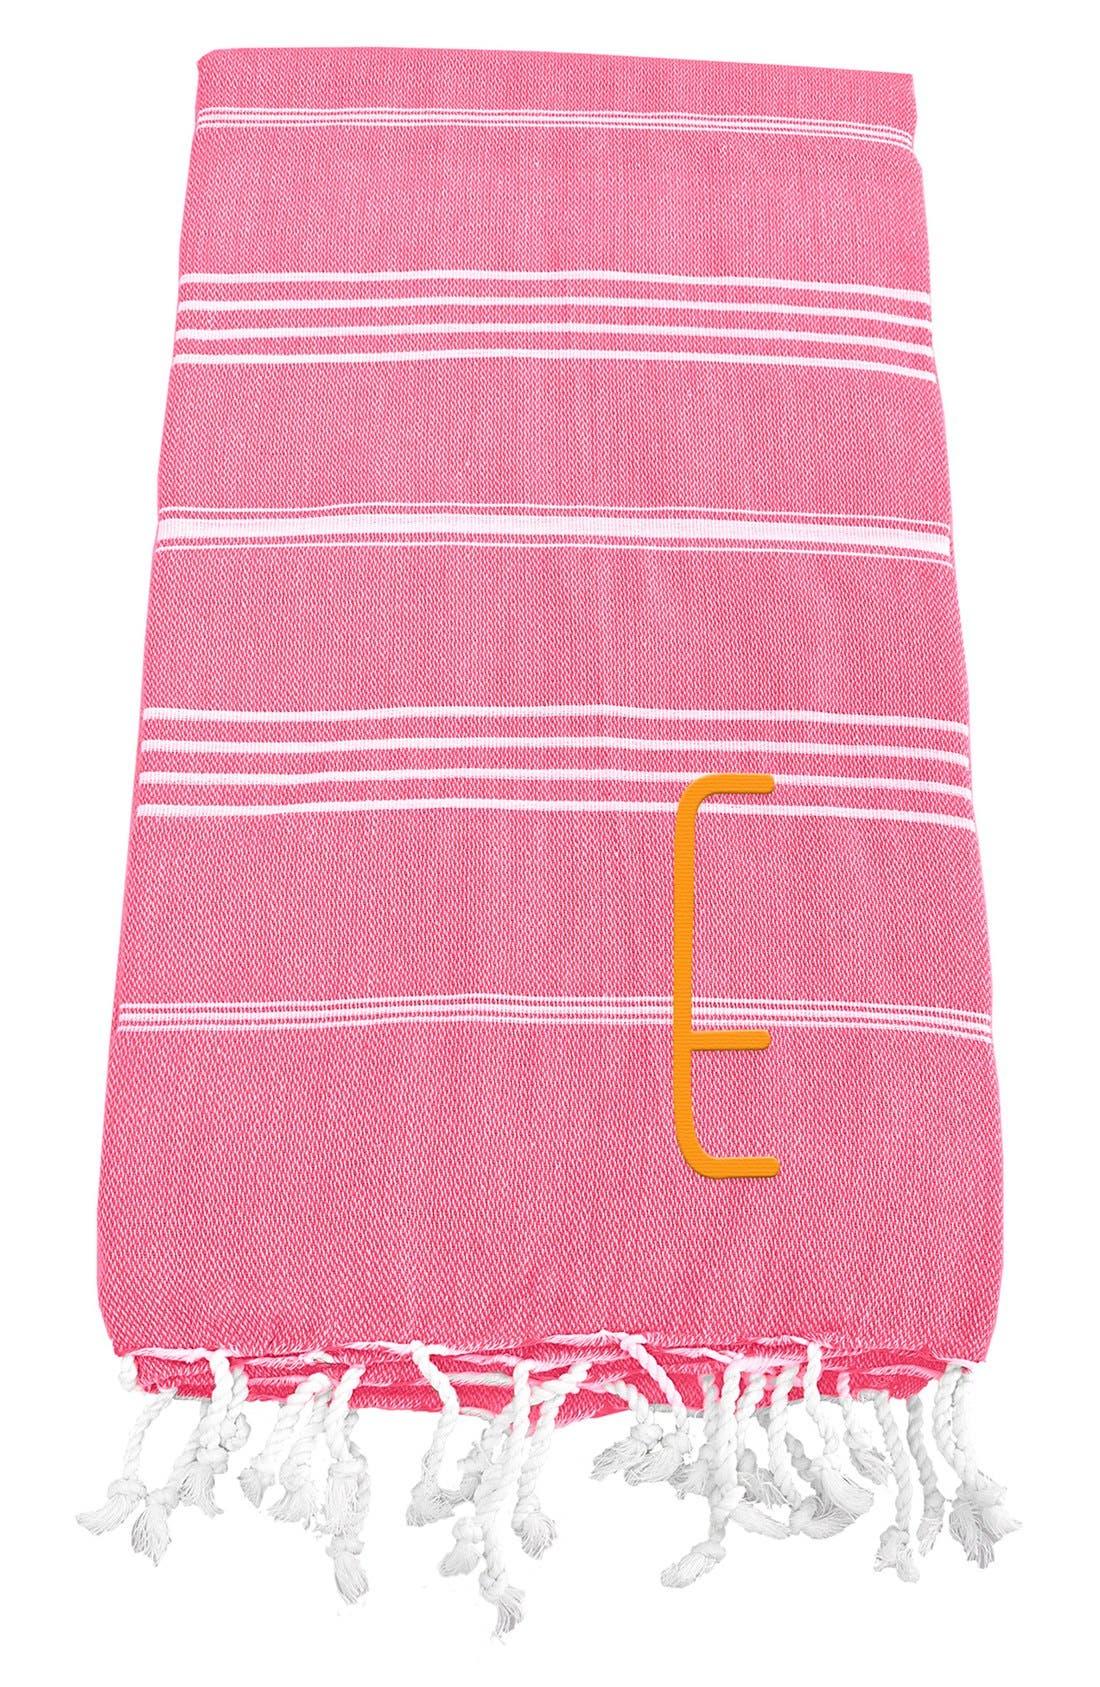 Monogram Turkish Cotton Towel,                             Main thumbnail 141, color,